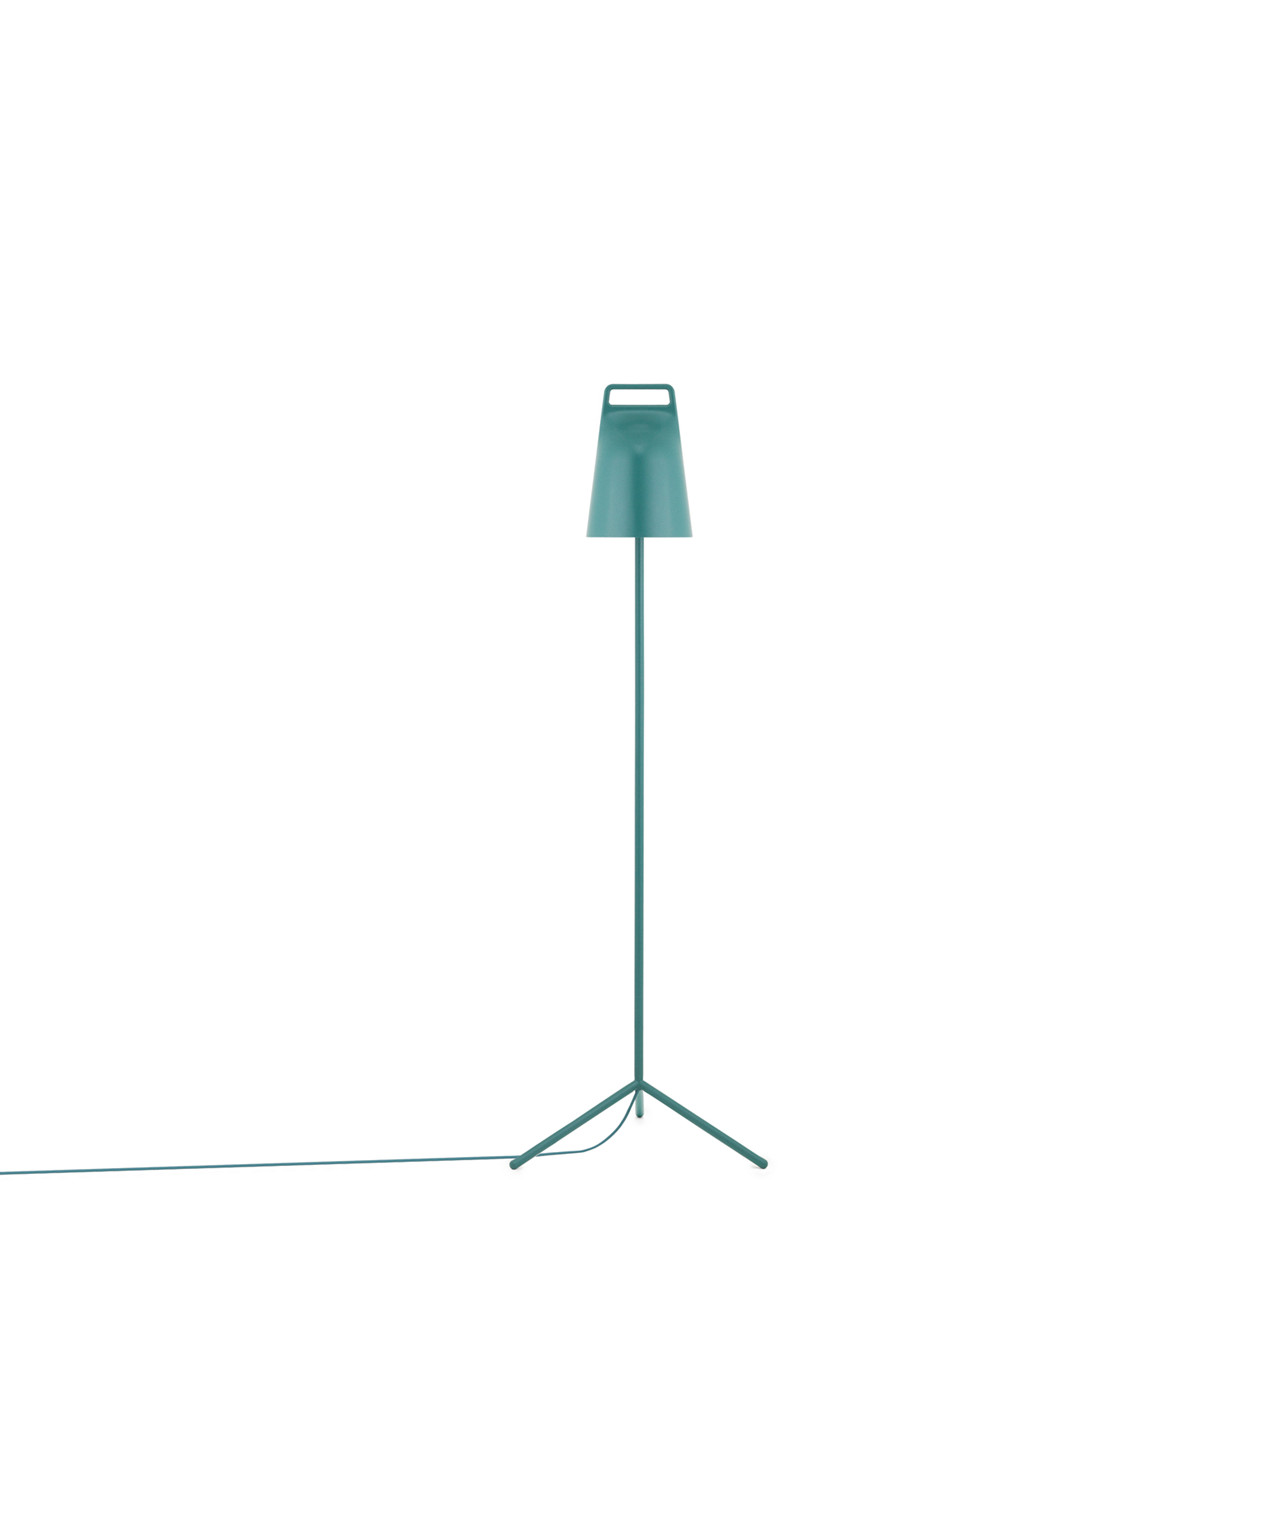 Stage gulvlampe petrol grøn